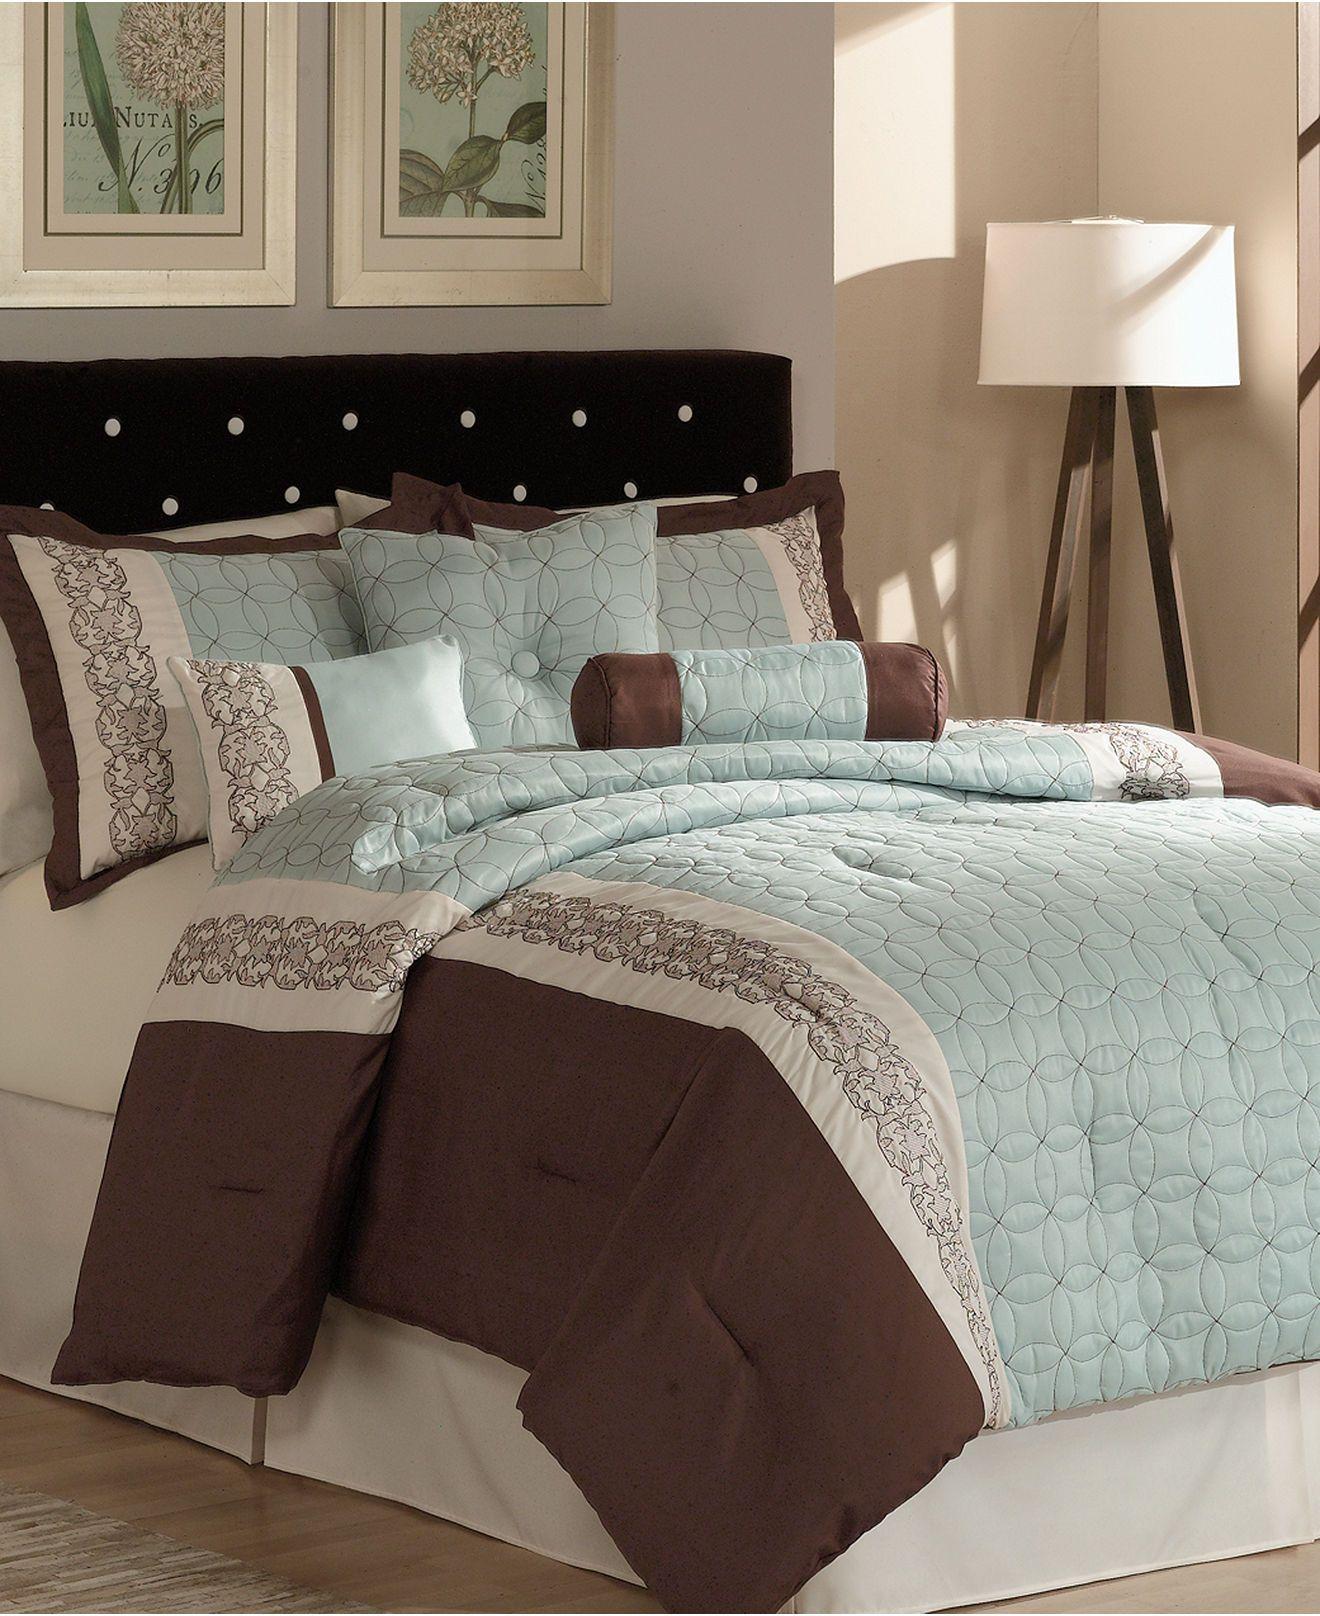 70b5e1aec98d960054faf4e4612bbb13 - Better Homes And Gardens Comforter Set Collection Tradewinds